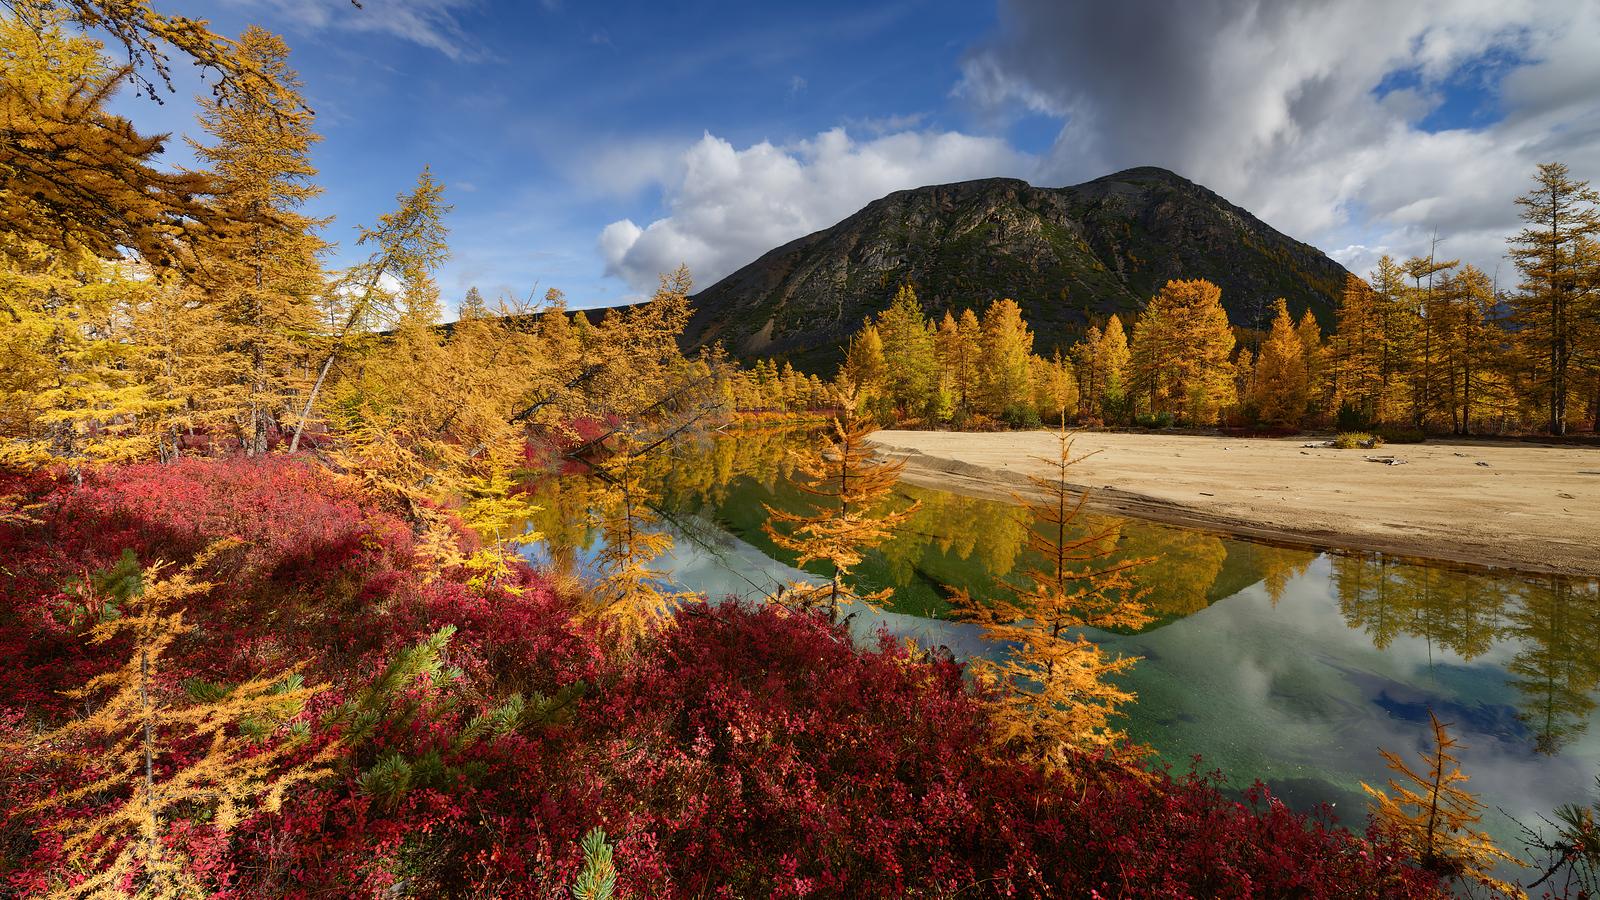 autumn-mood-jack-london-lake-4k-xp.jpg